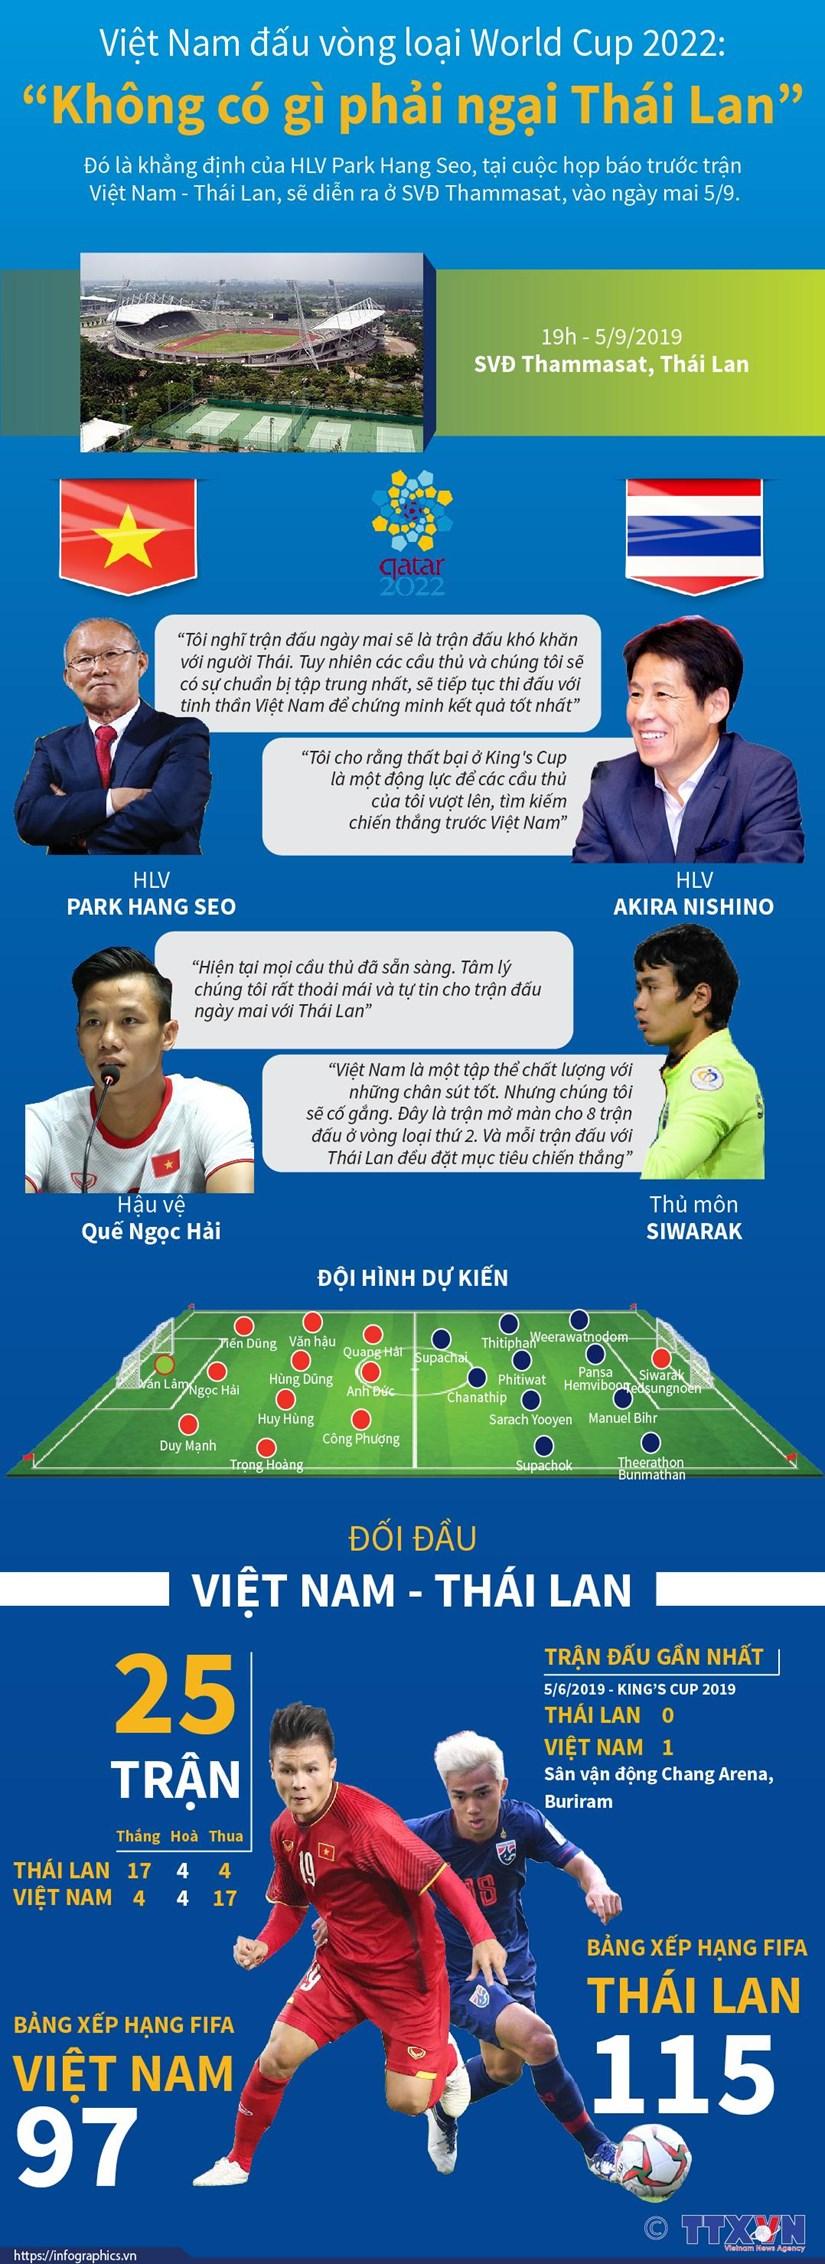 Viet Nam va Thai Lan 'ham nong' tran chien tai vong loai World Cup hinh anh 1